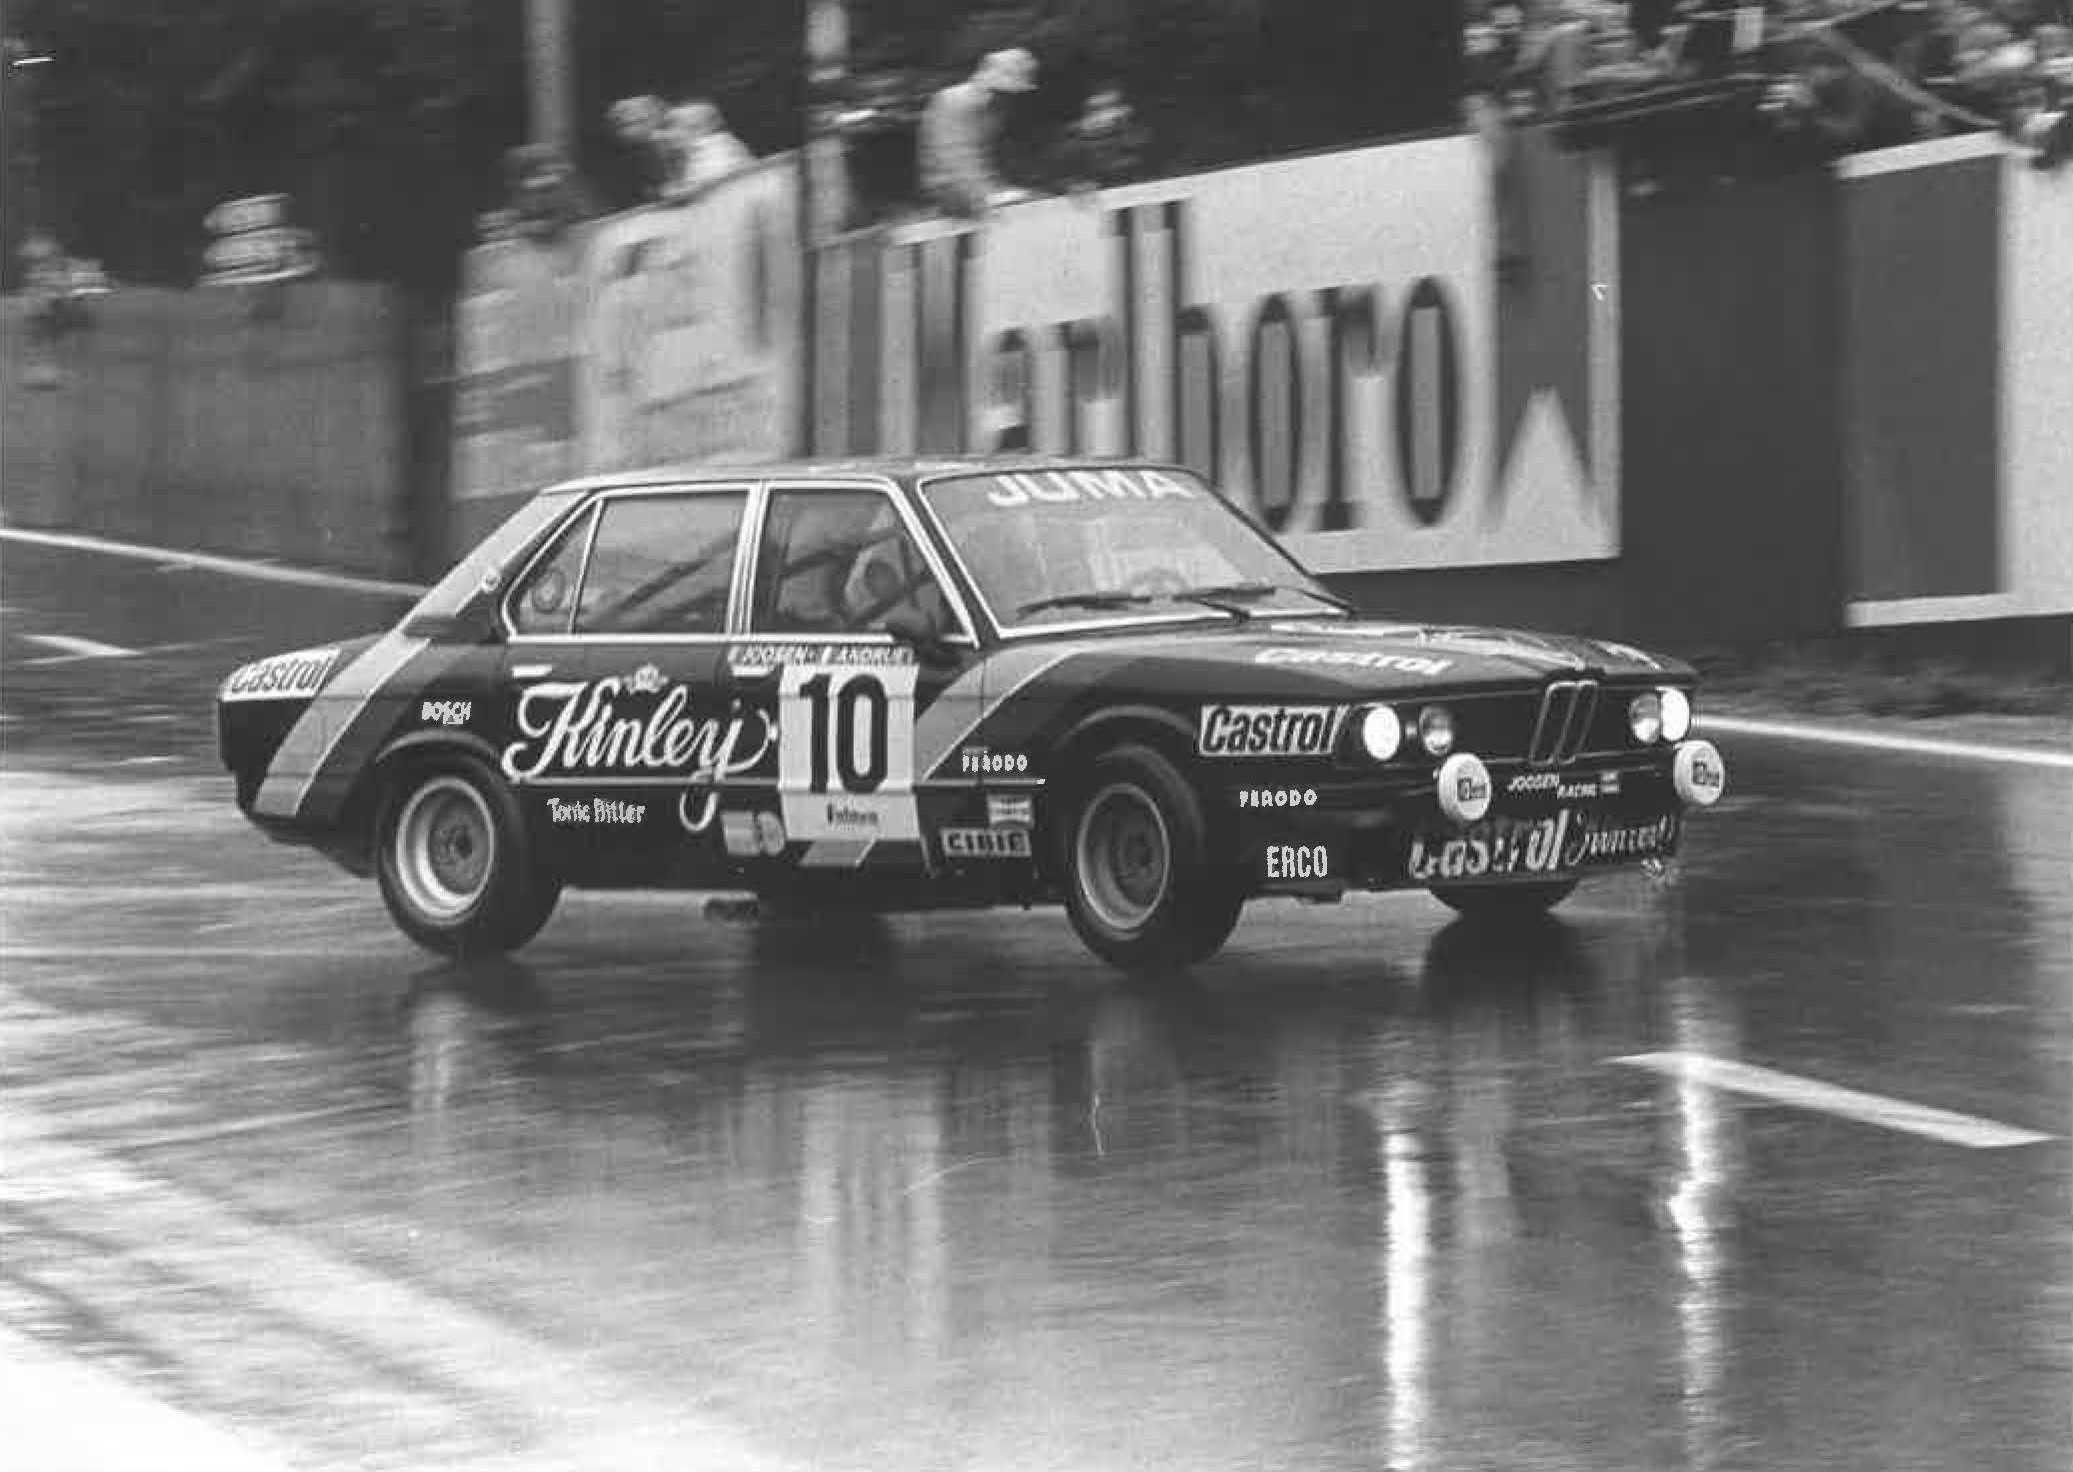 1977 BMW 530 IUS - Joosen-Andruet (06/2020)